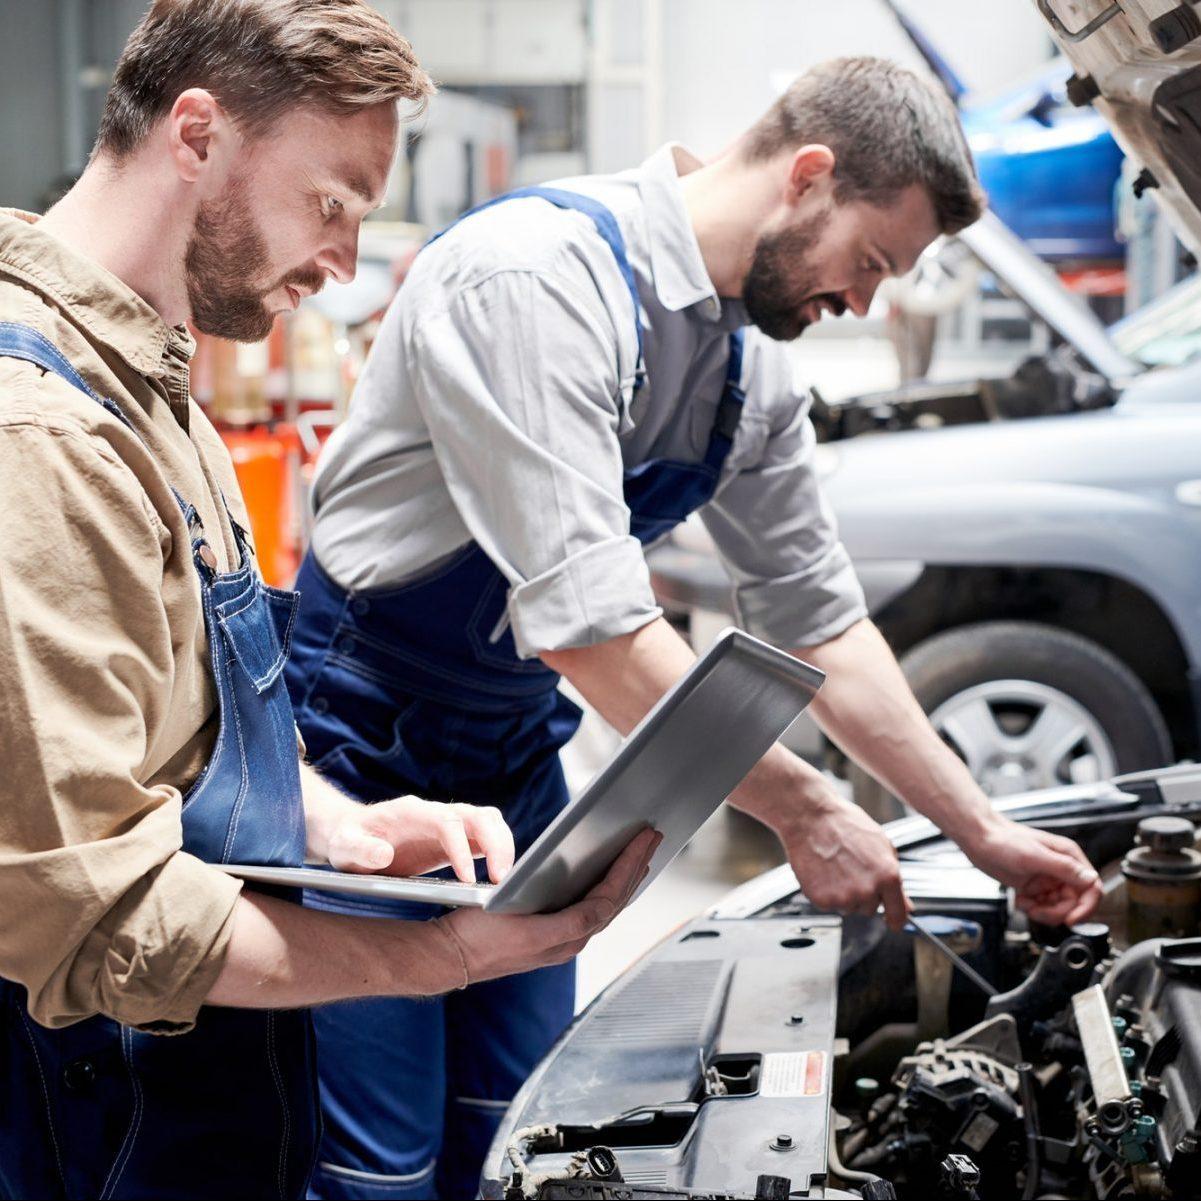 Mechanics Working in Car Service